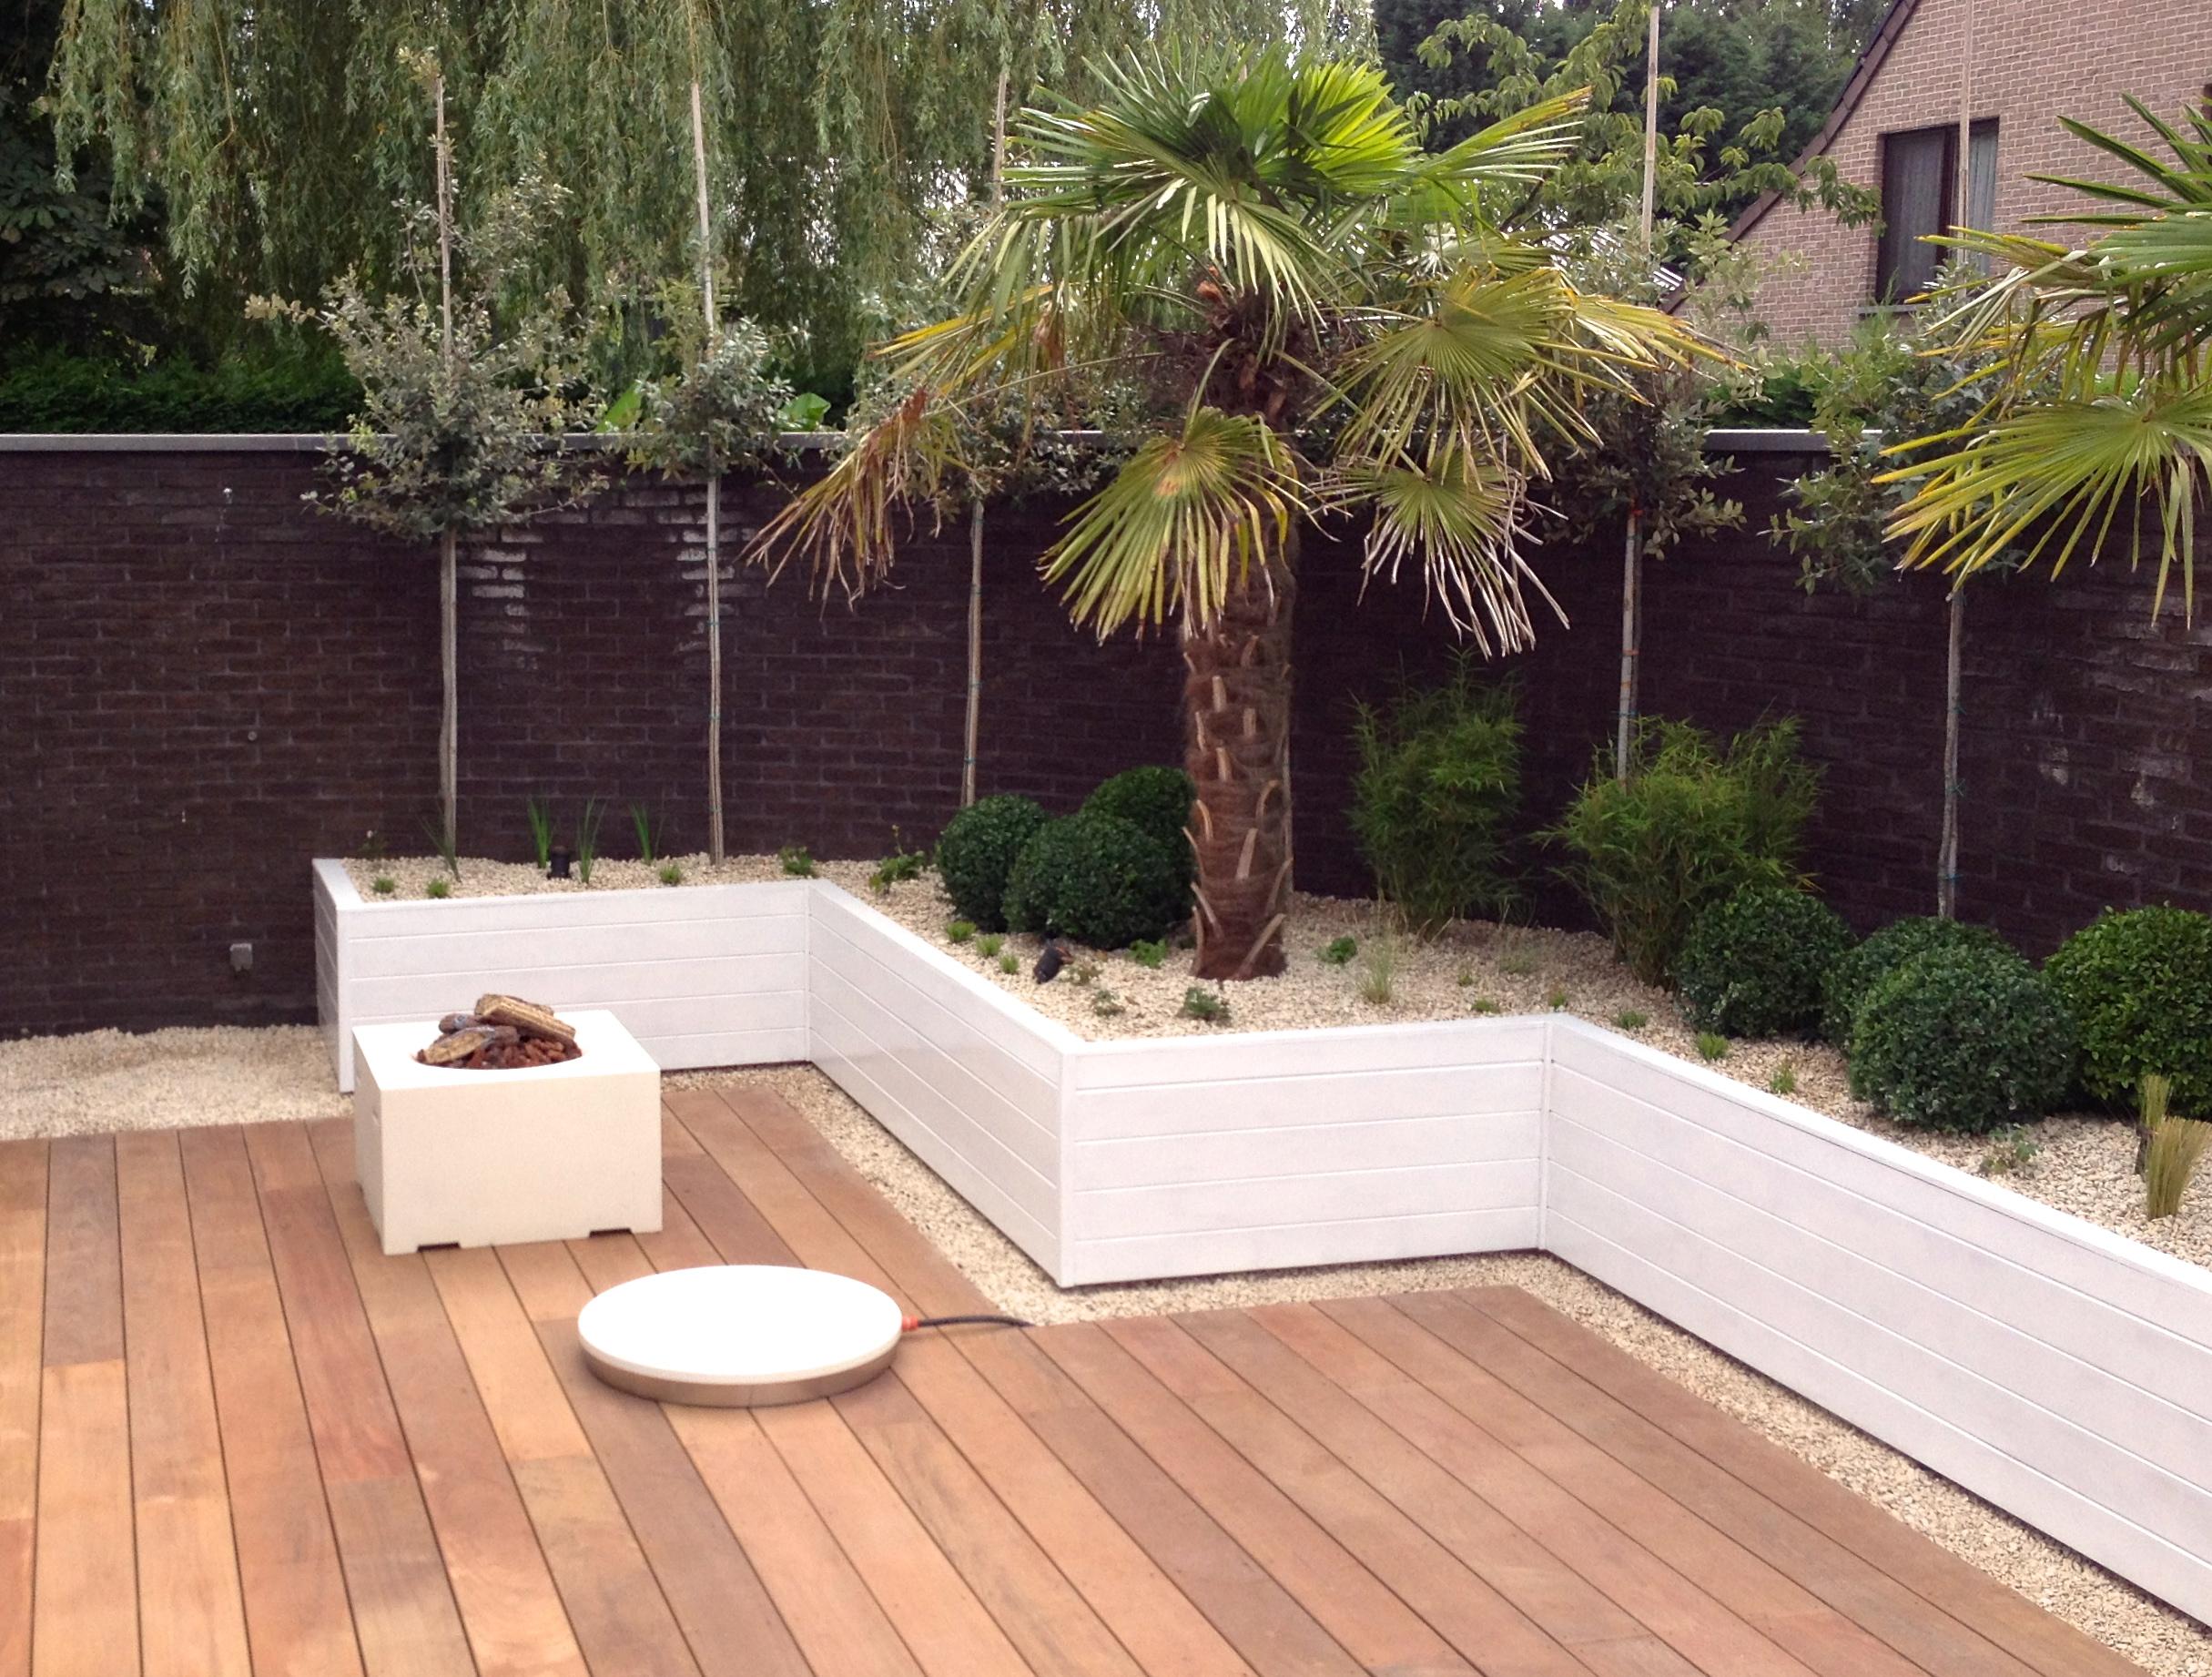 wellness terras de telder tuinen. Black Bedroom Furniture Sets. Home Design Ideas